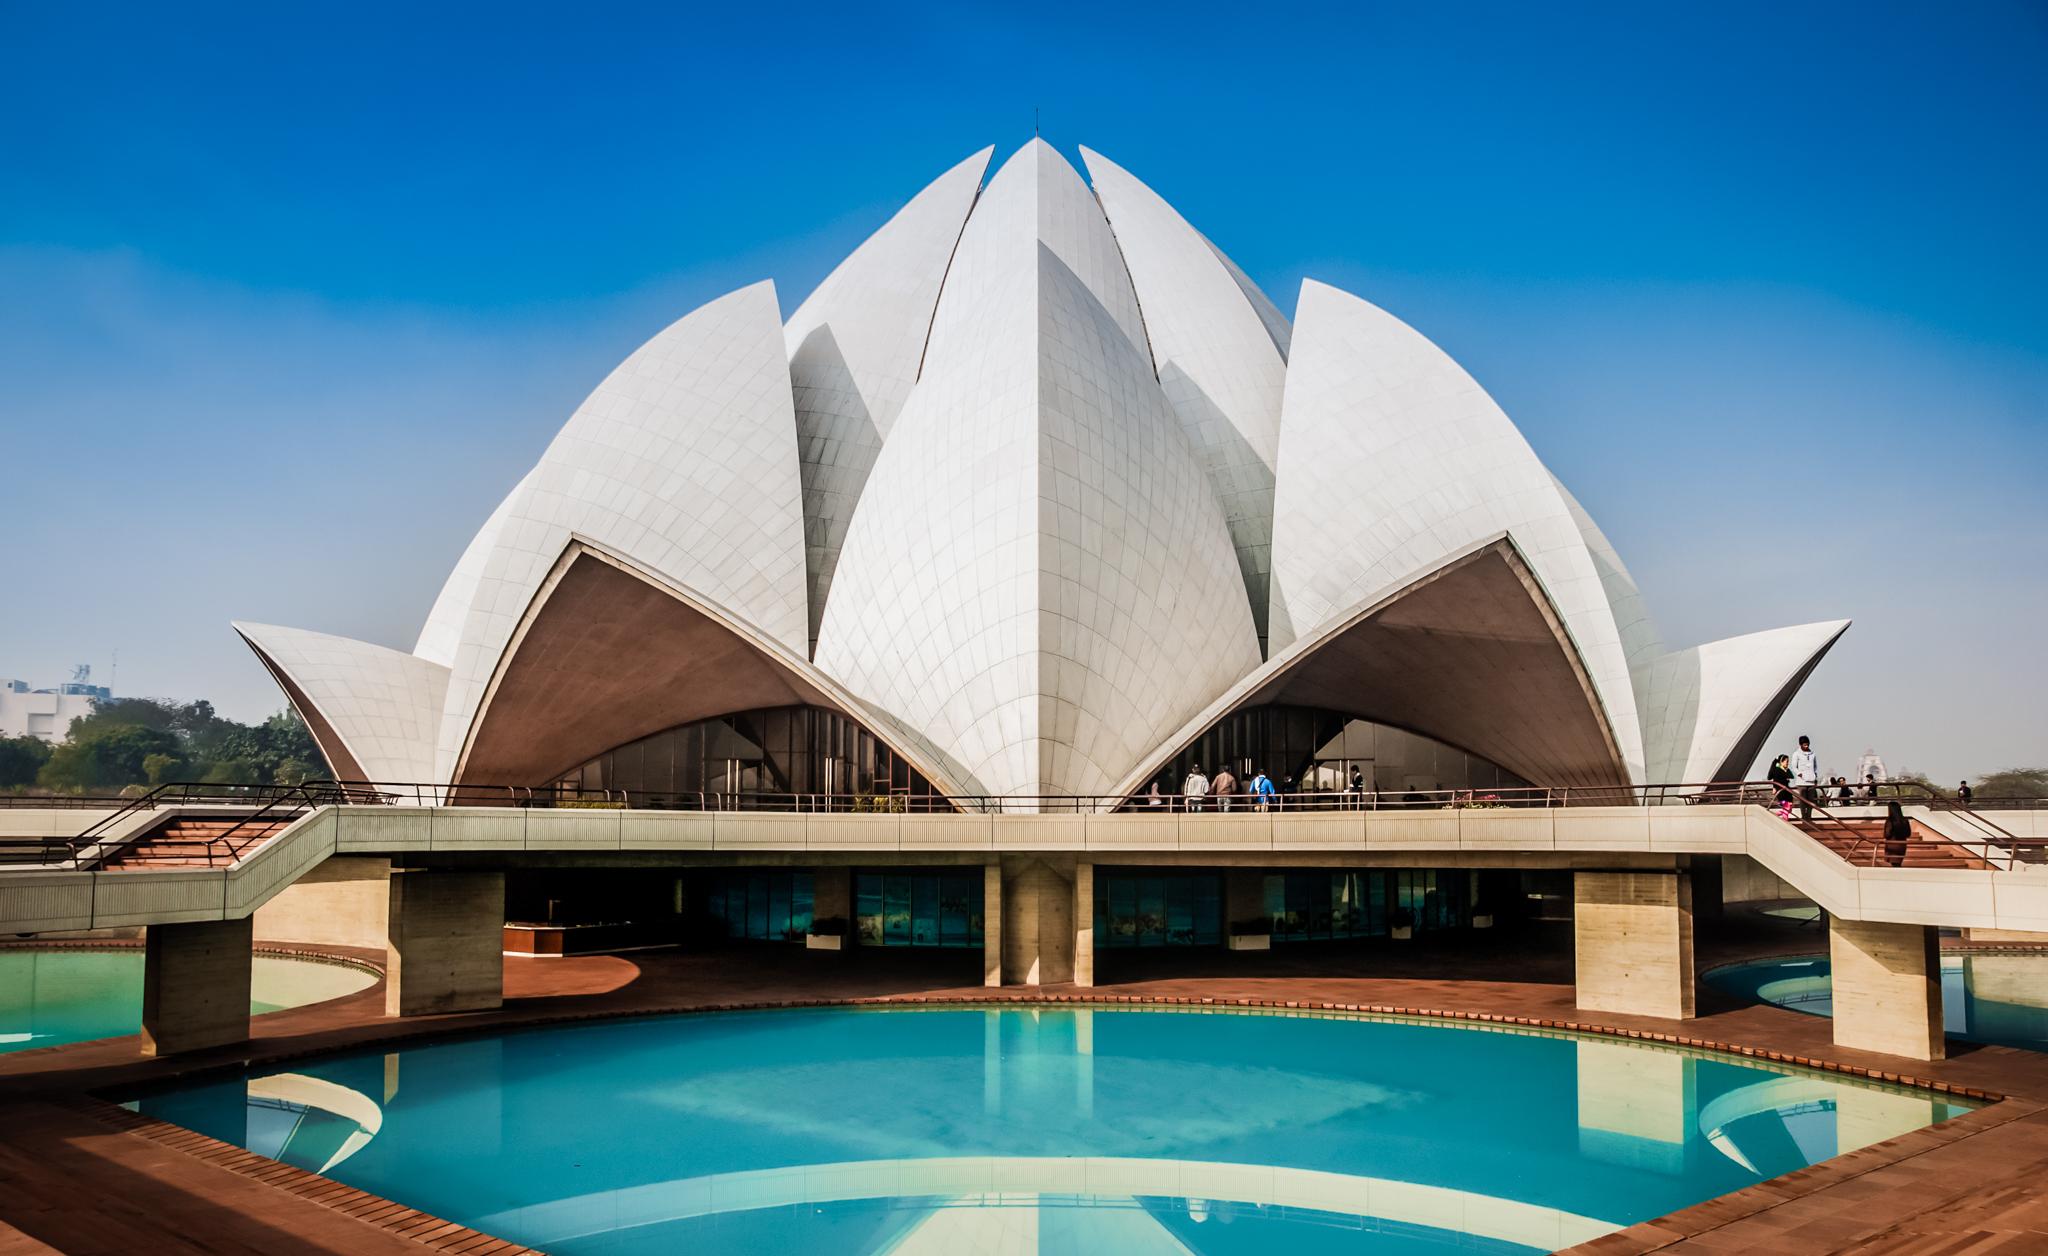 Bahi (Lotus) Temple, New Delhi, India